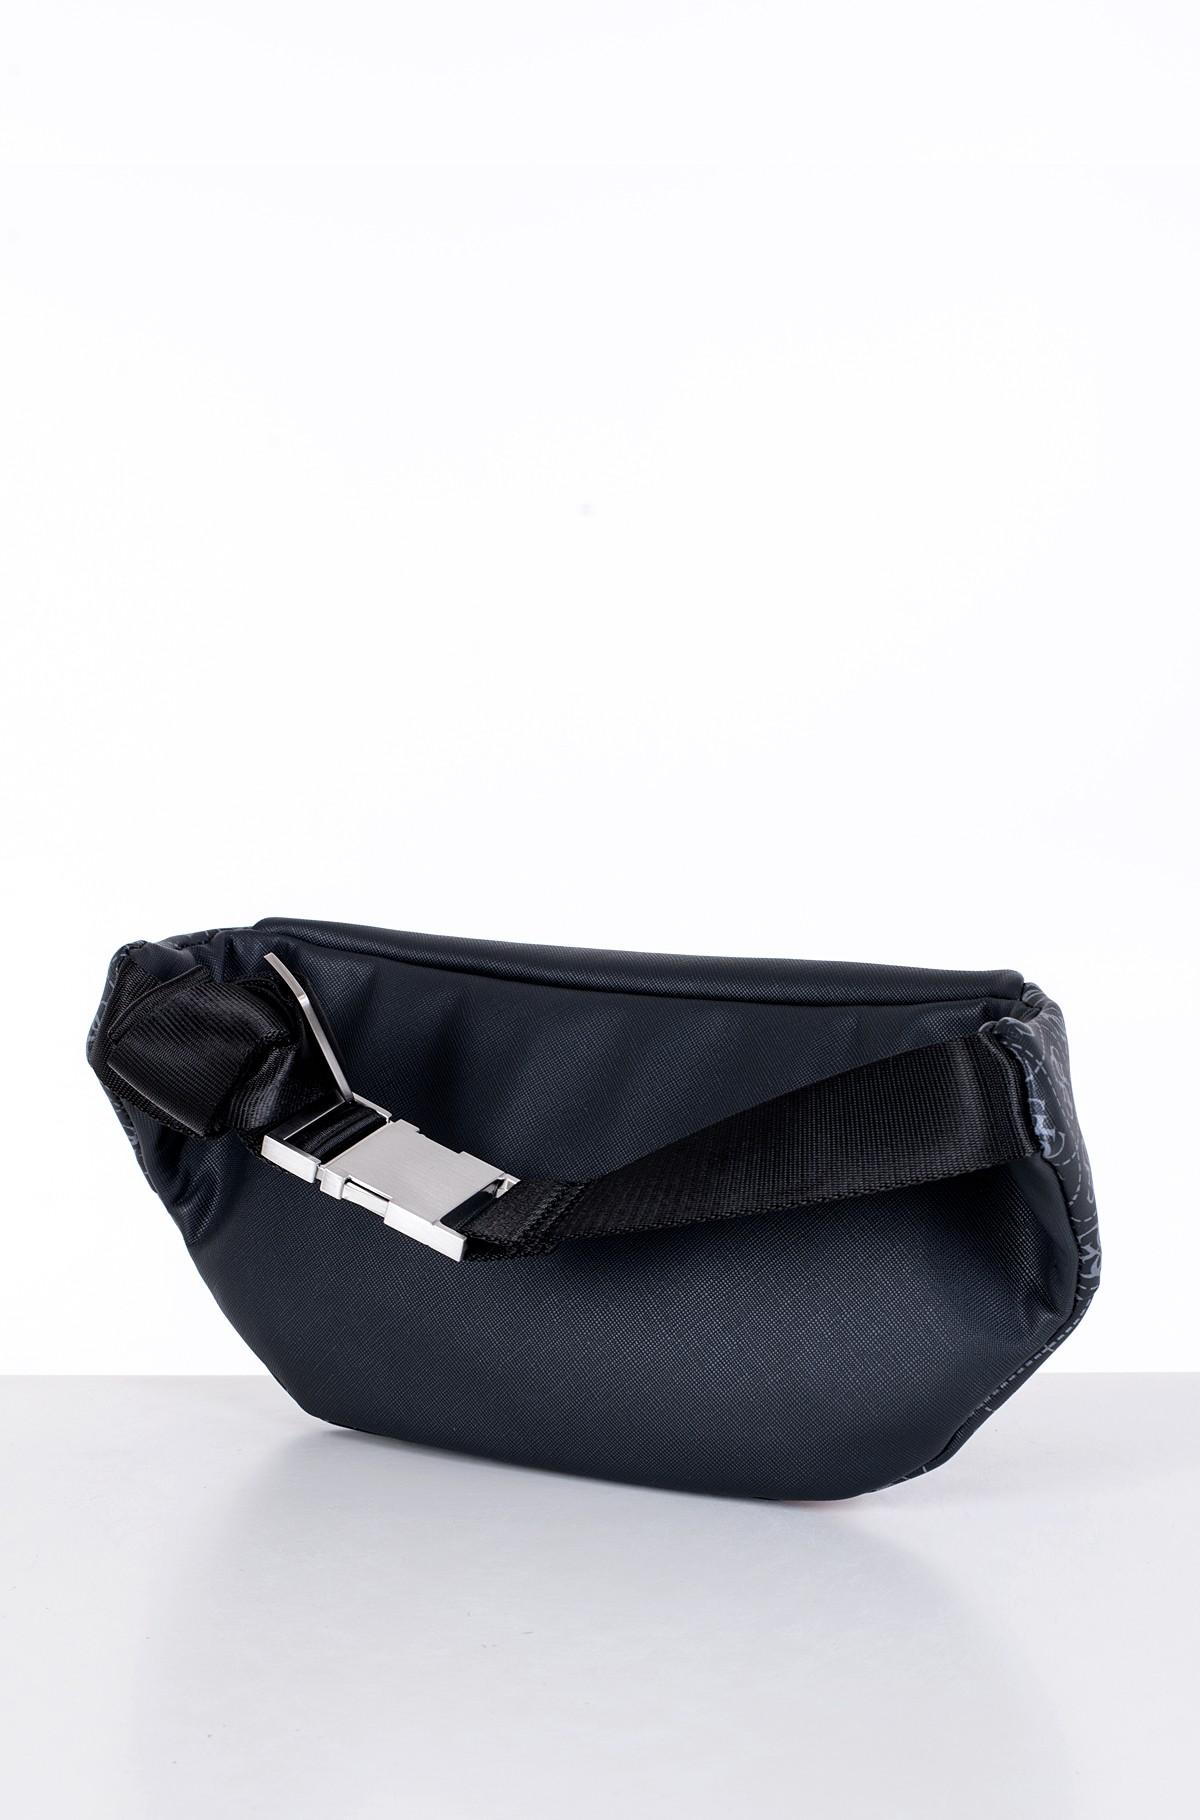 Waist bag/shoulder bag HMDANL P0330-full-3